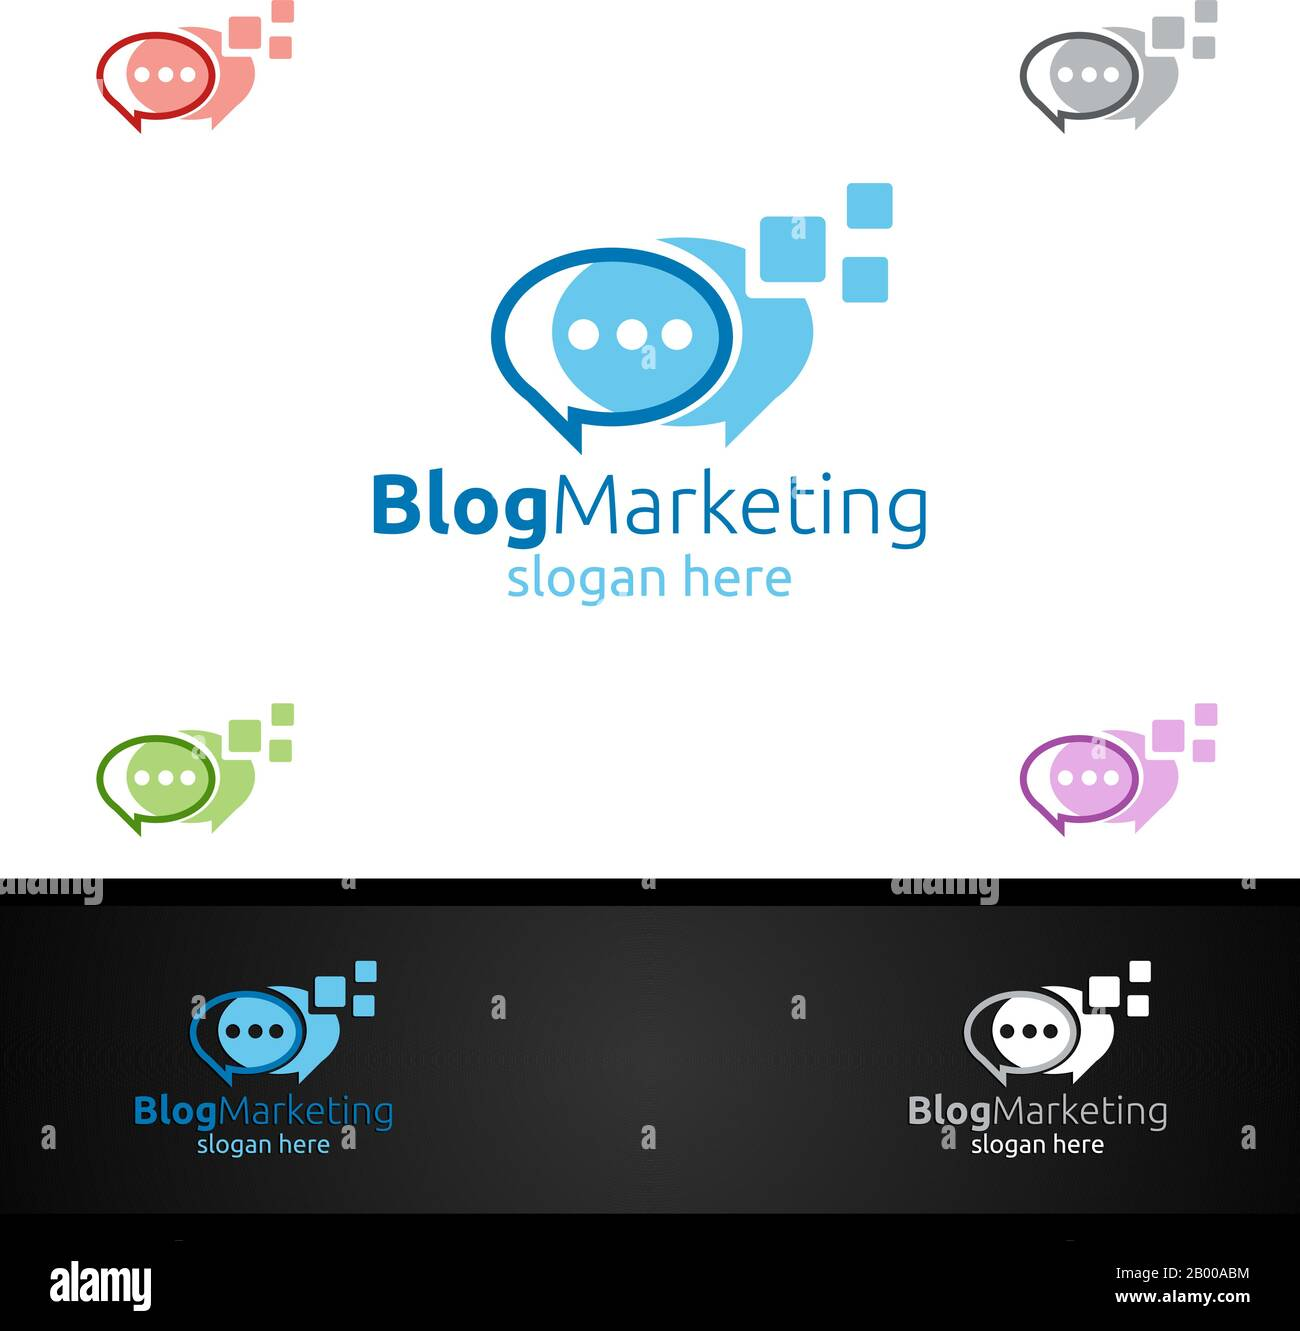 blog digital marketing financial advisor vector logo design template icon stock vector image art alamy alamy